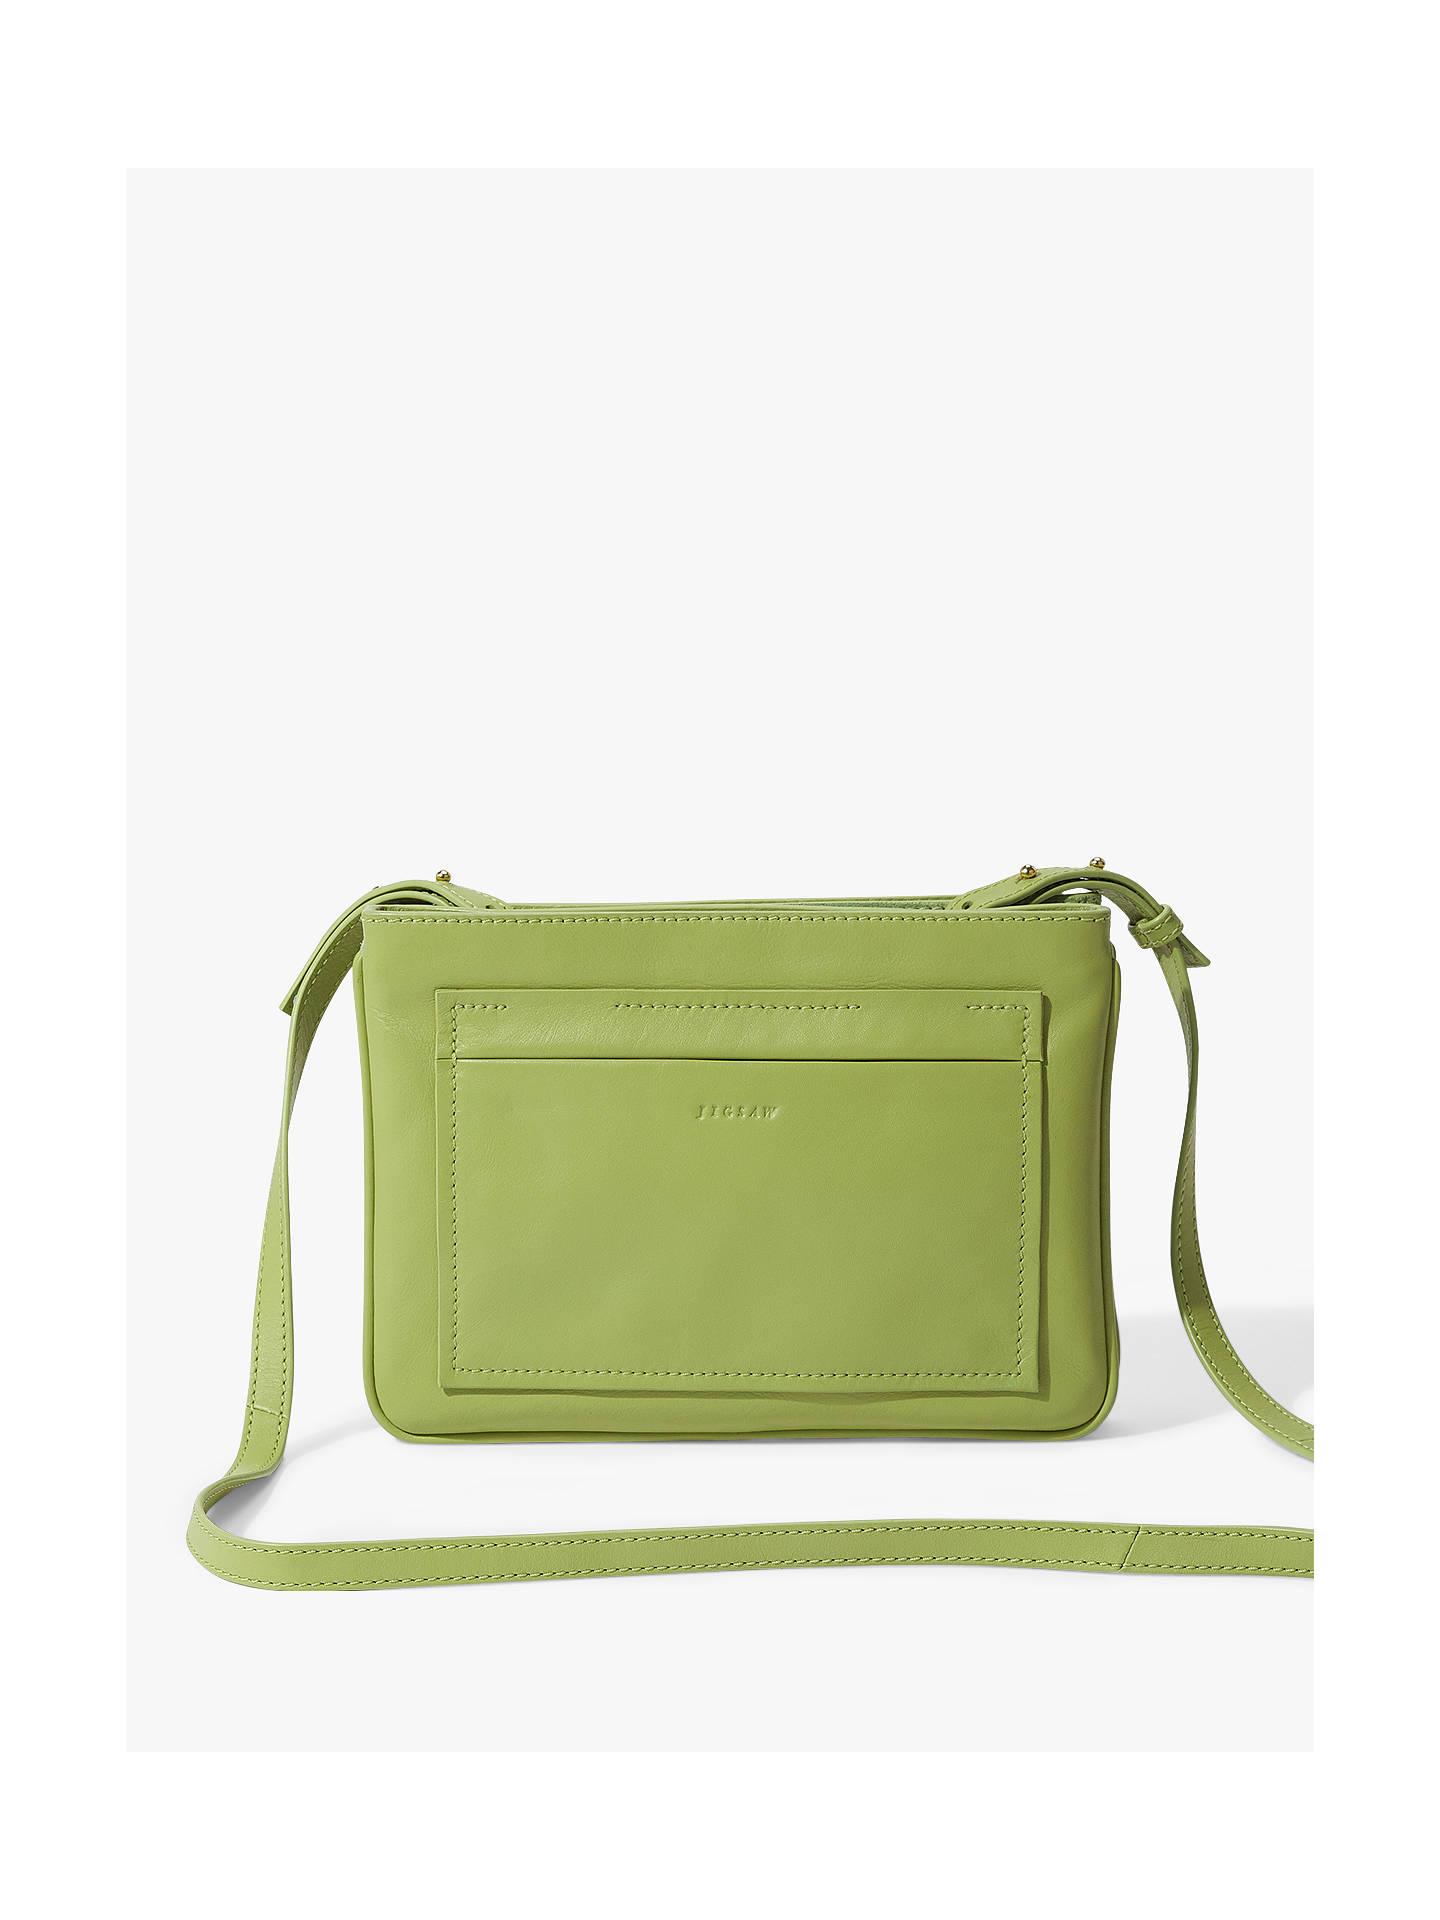 1e7d03766fc Jigsaw Tanvi Gusset Leather Crossbody Bag, Lime Green